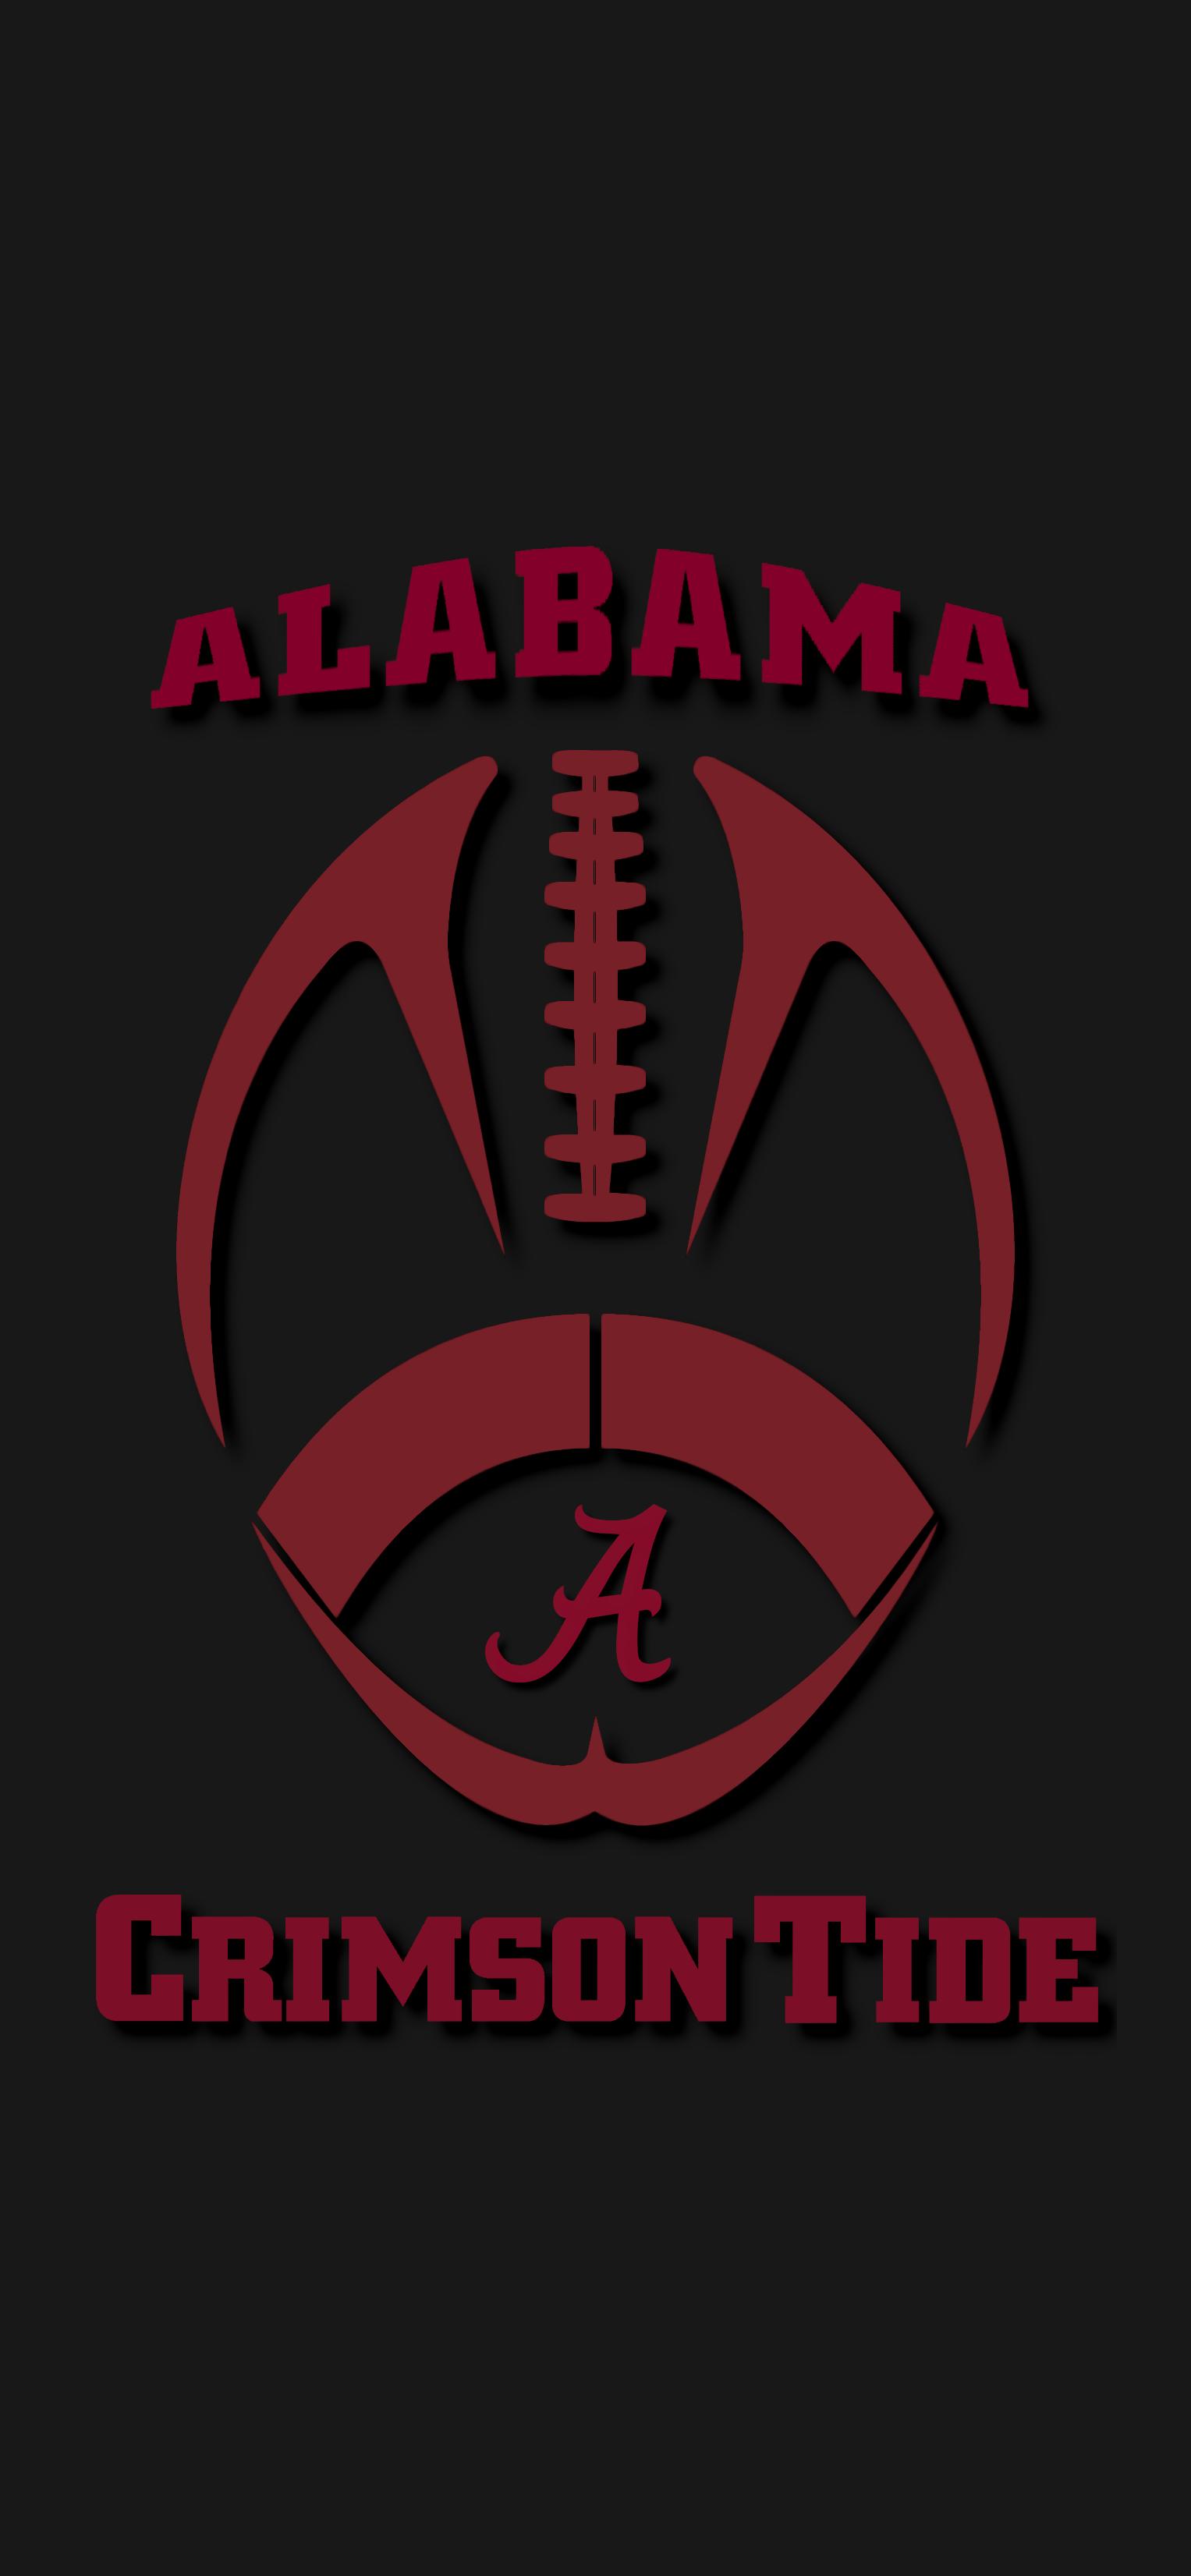 Nike 1 Alabama Crimson Tide Logo Alabama Crimson Tide Alabama Crimson Tide Football